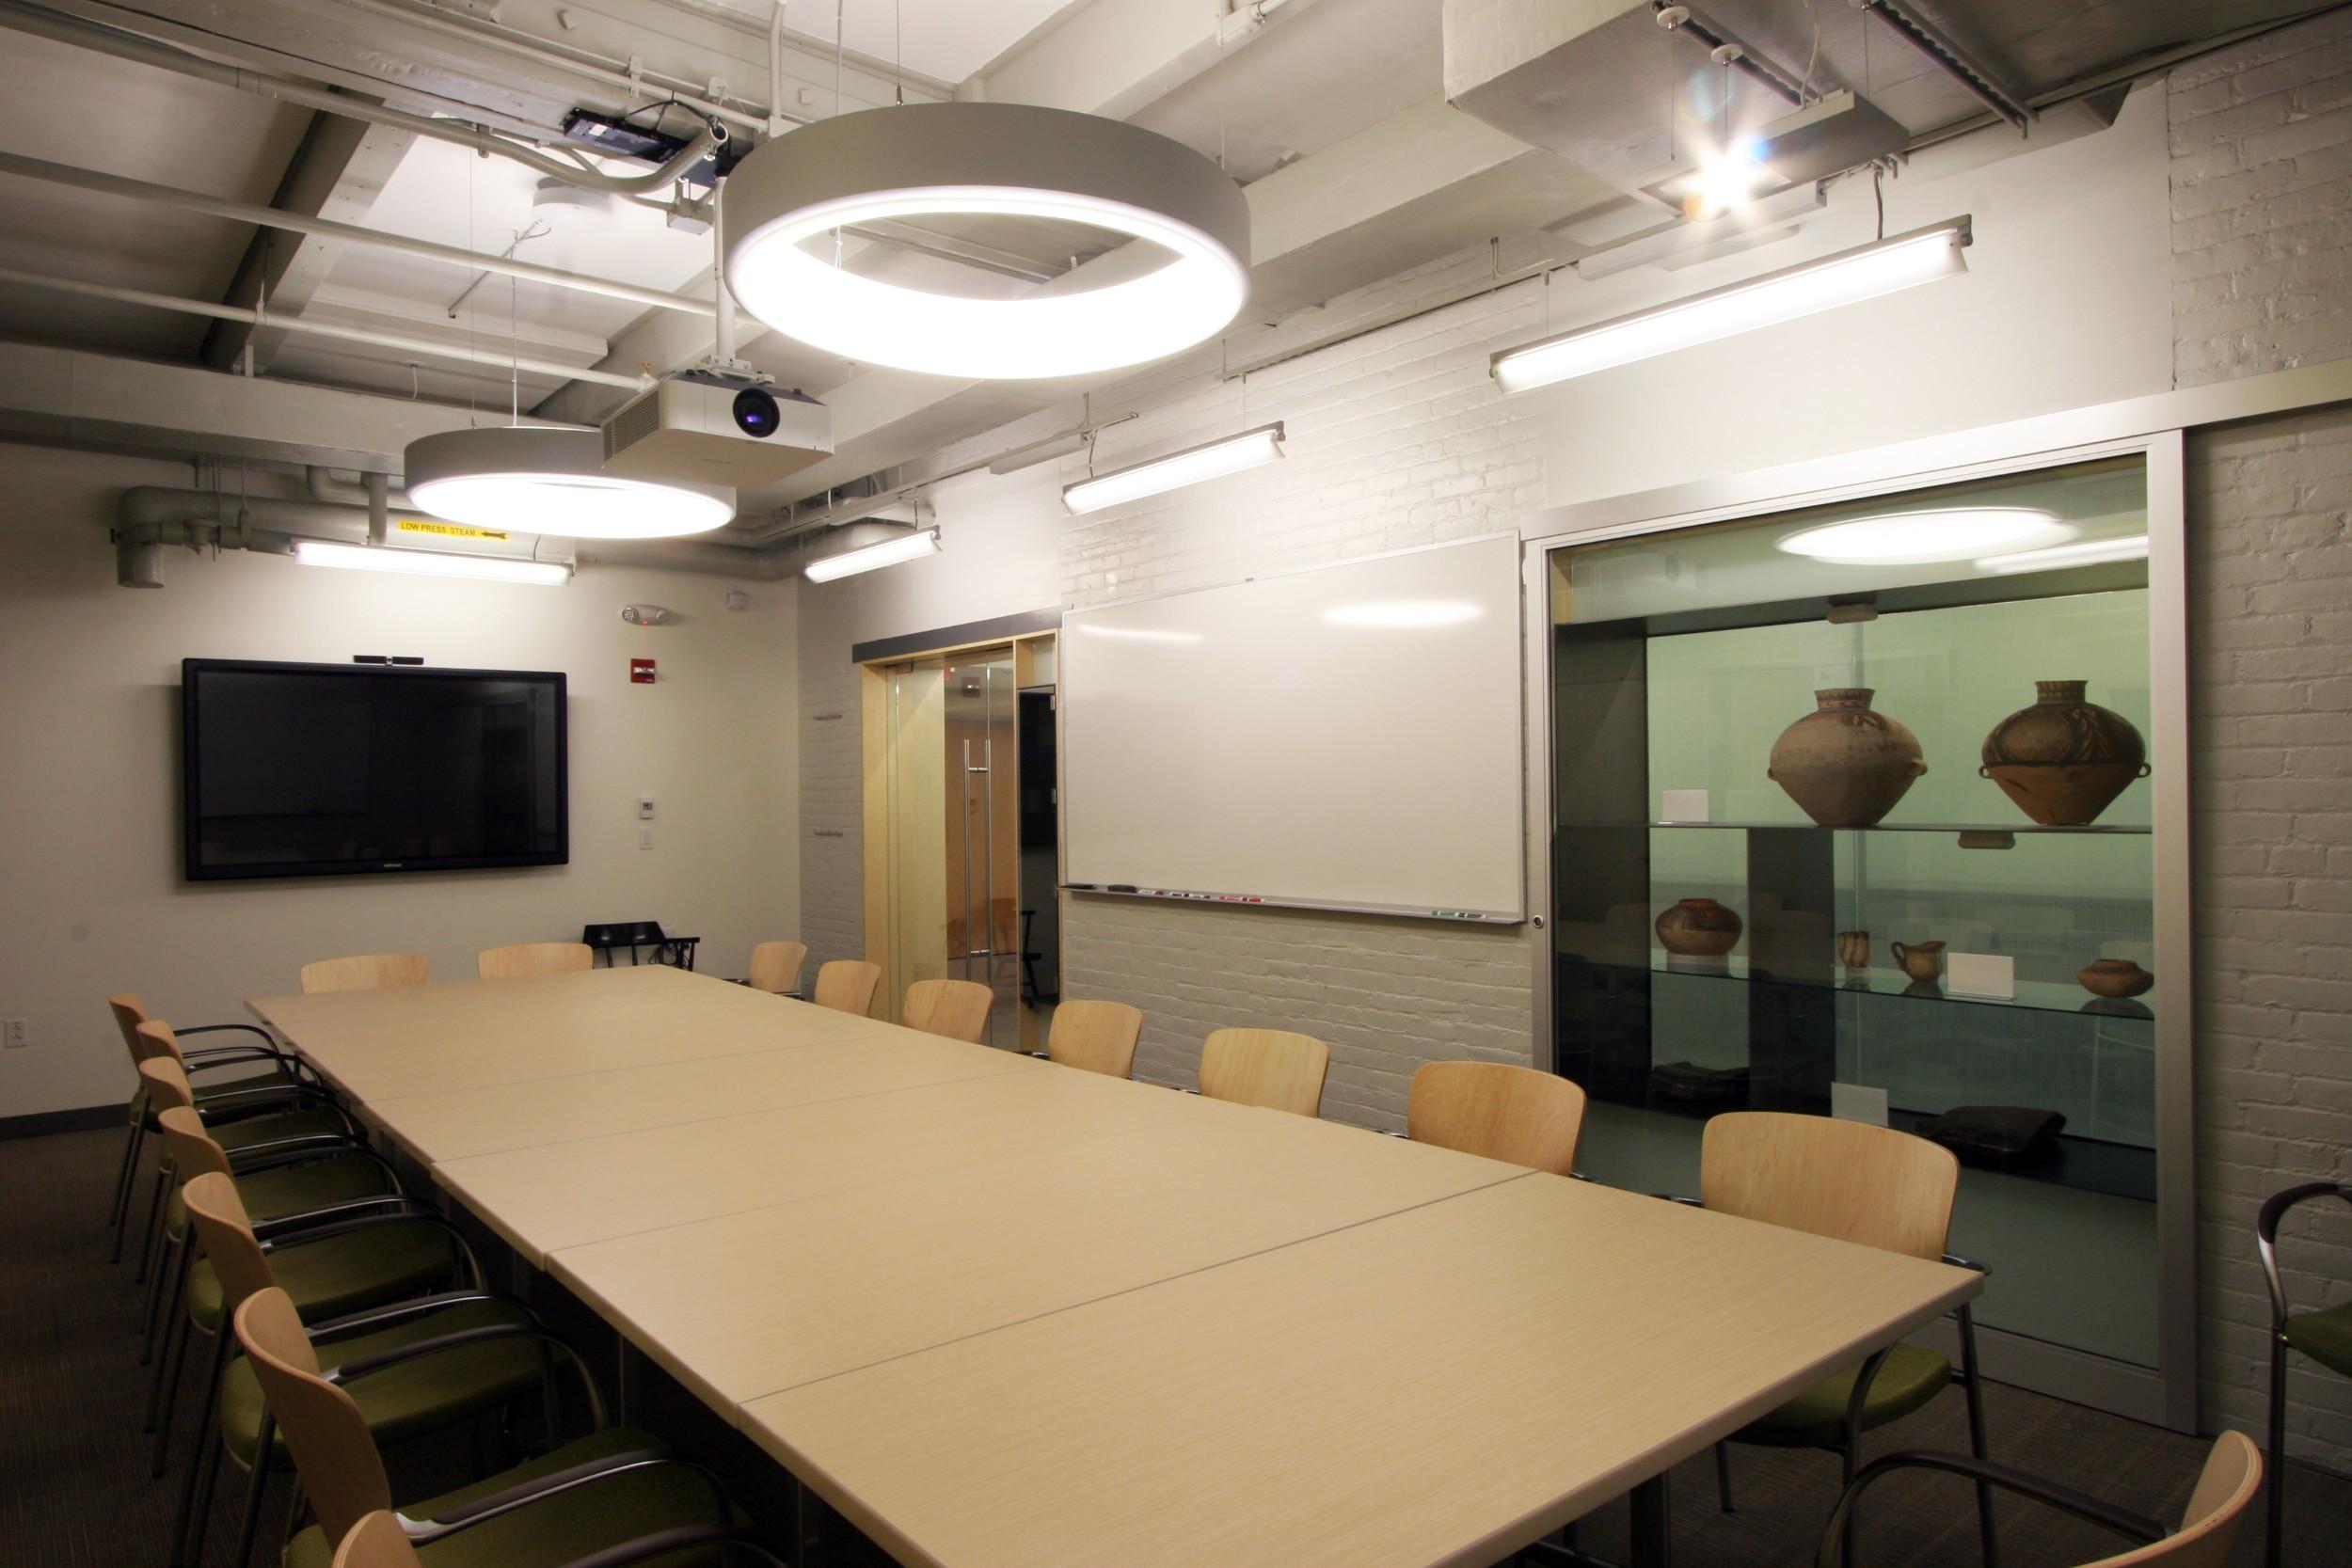 Harvard_University_Corderman_Construction_Anthropology_Department_Conference_Room.jpg